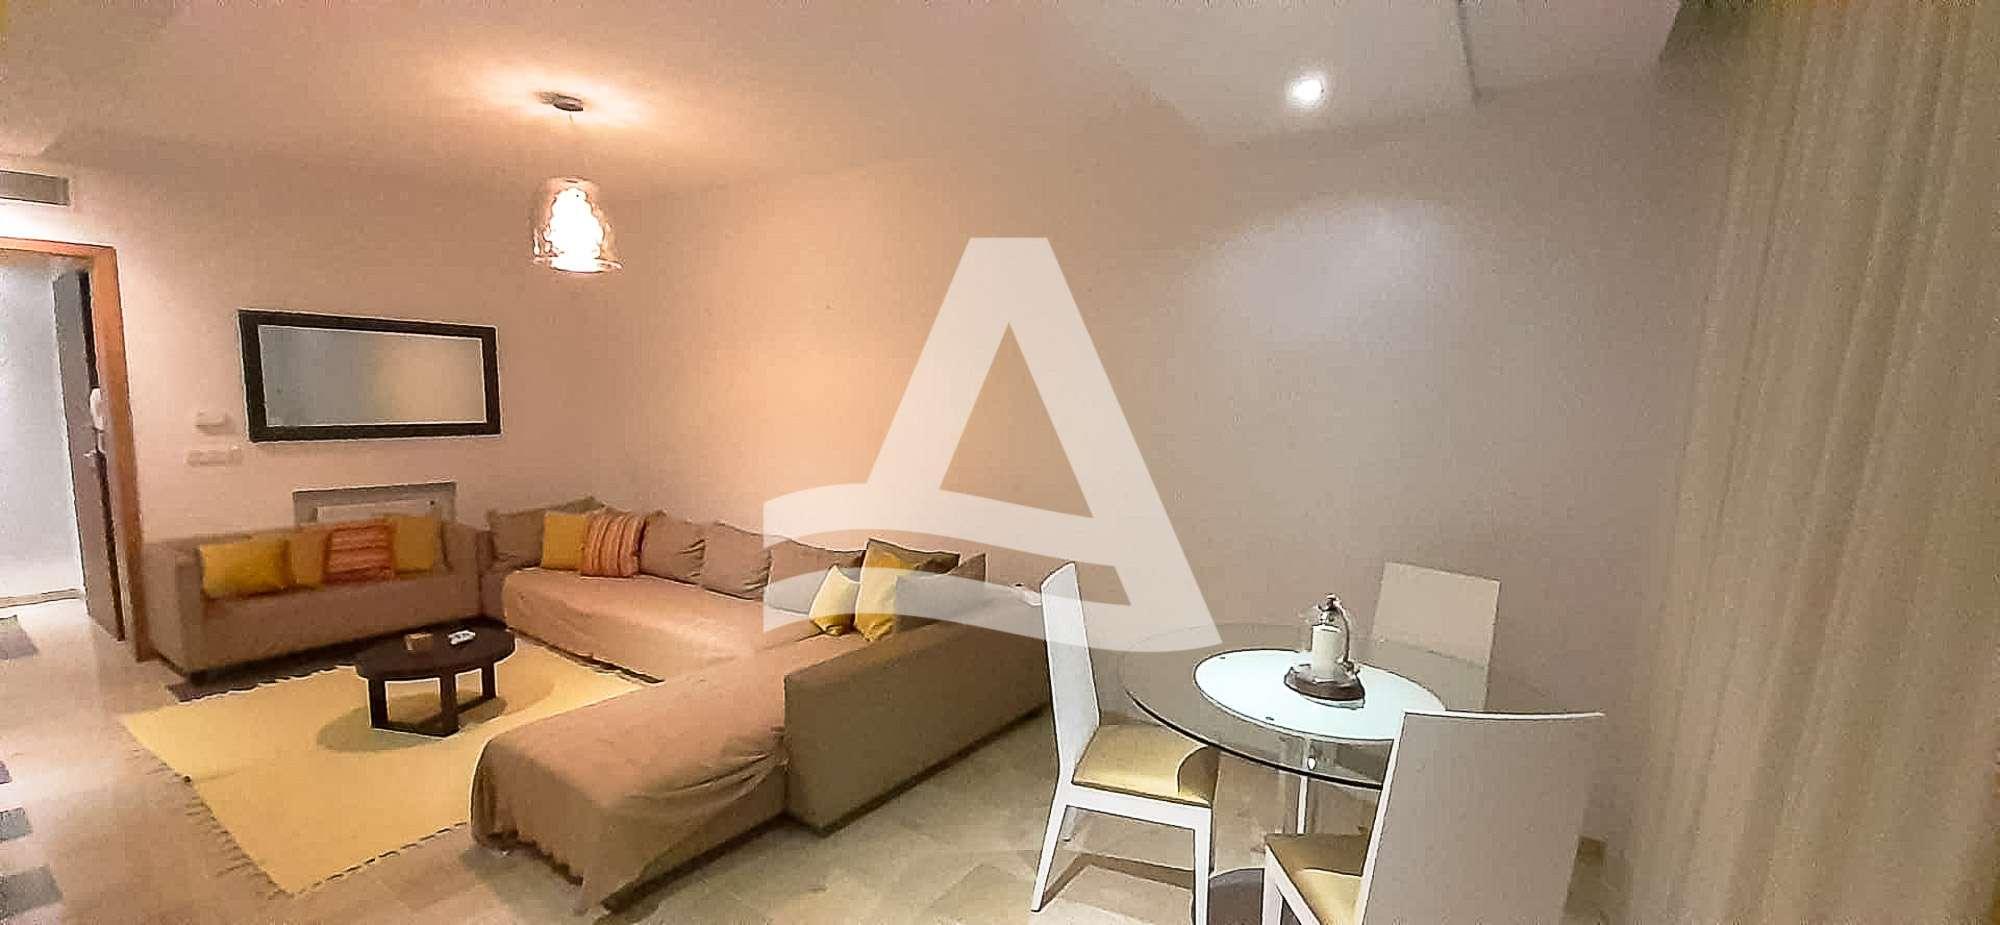 httpss3.amazonaws.comlogimoaws_Arcane_immobilière_la_Marsa-_location_-_vente_la_marsa_10_sur_12_1574867274172